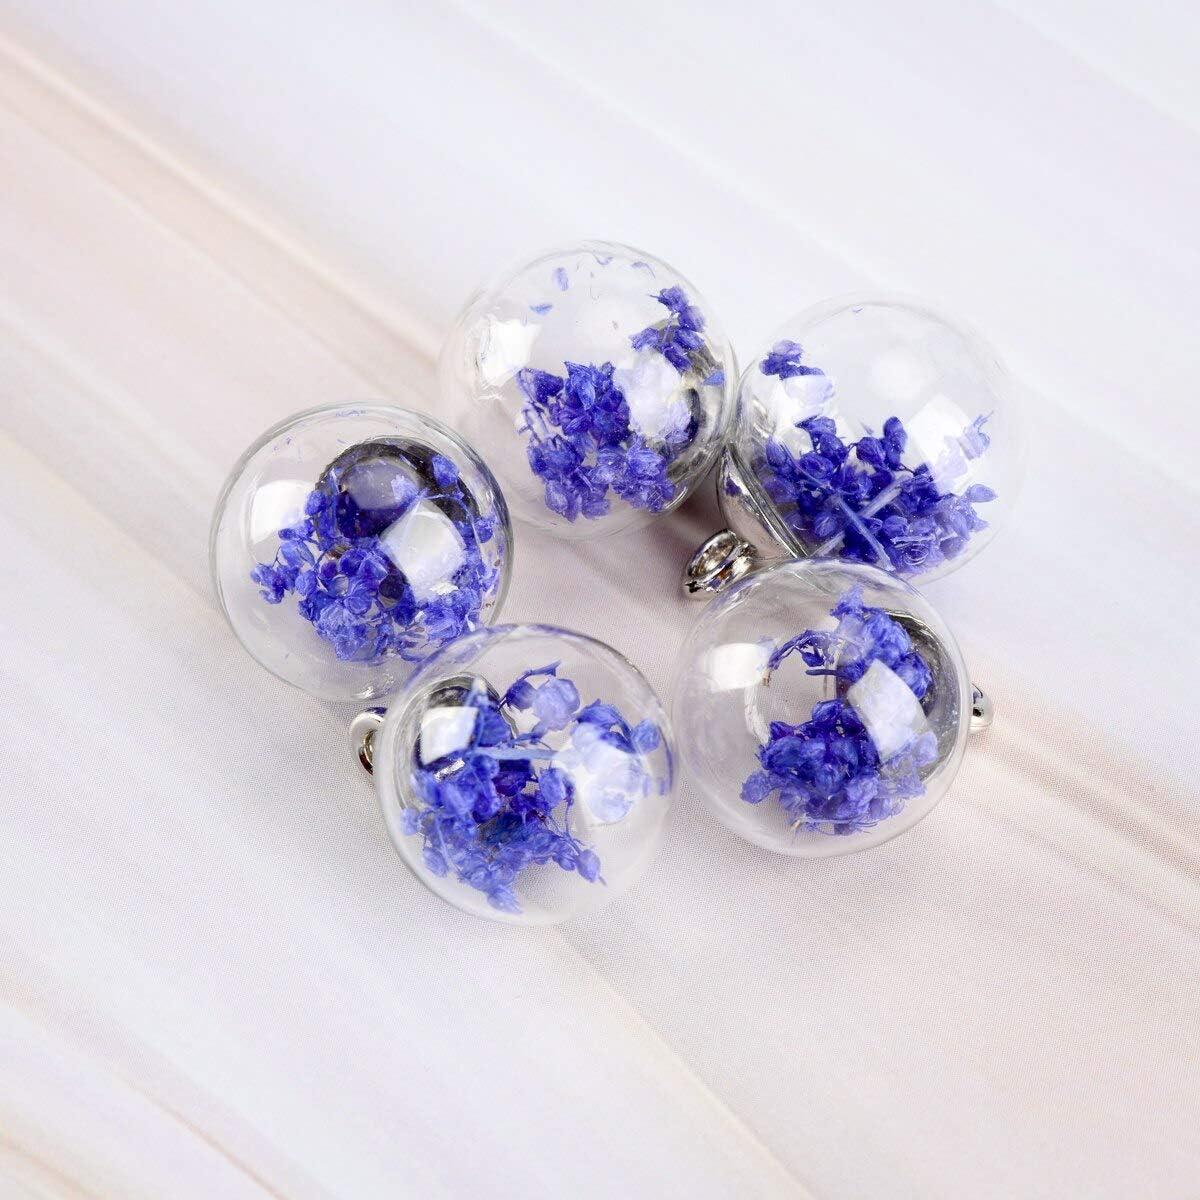 Bag of natural and glass gemstones